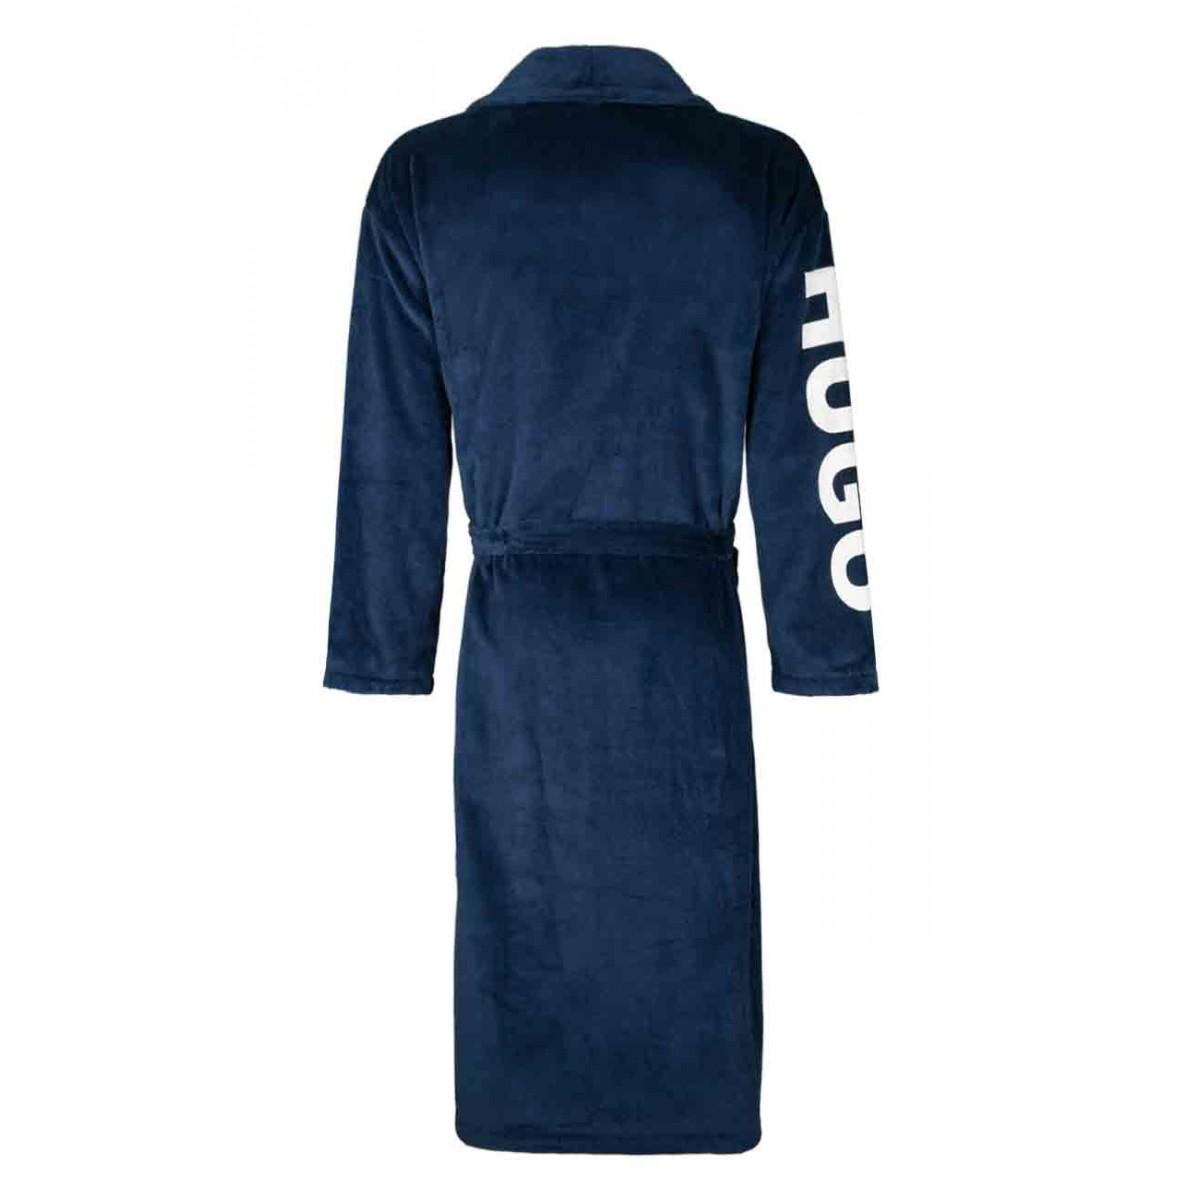 Badjas met geprinte mouw